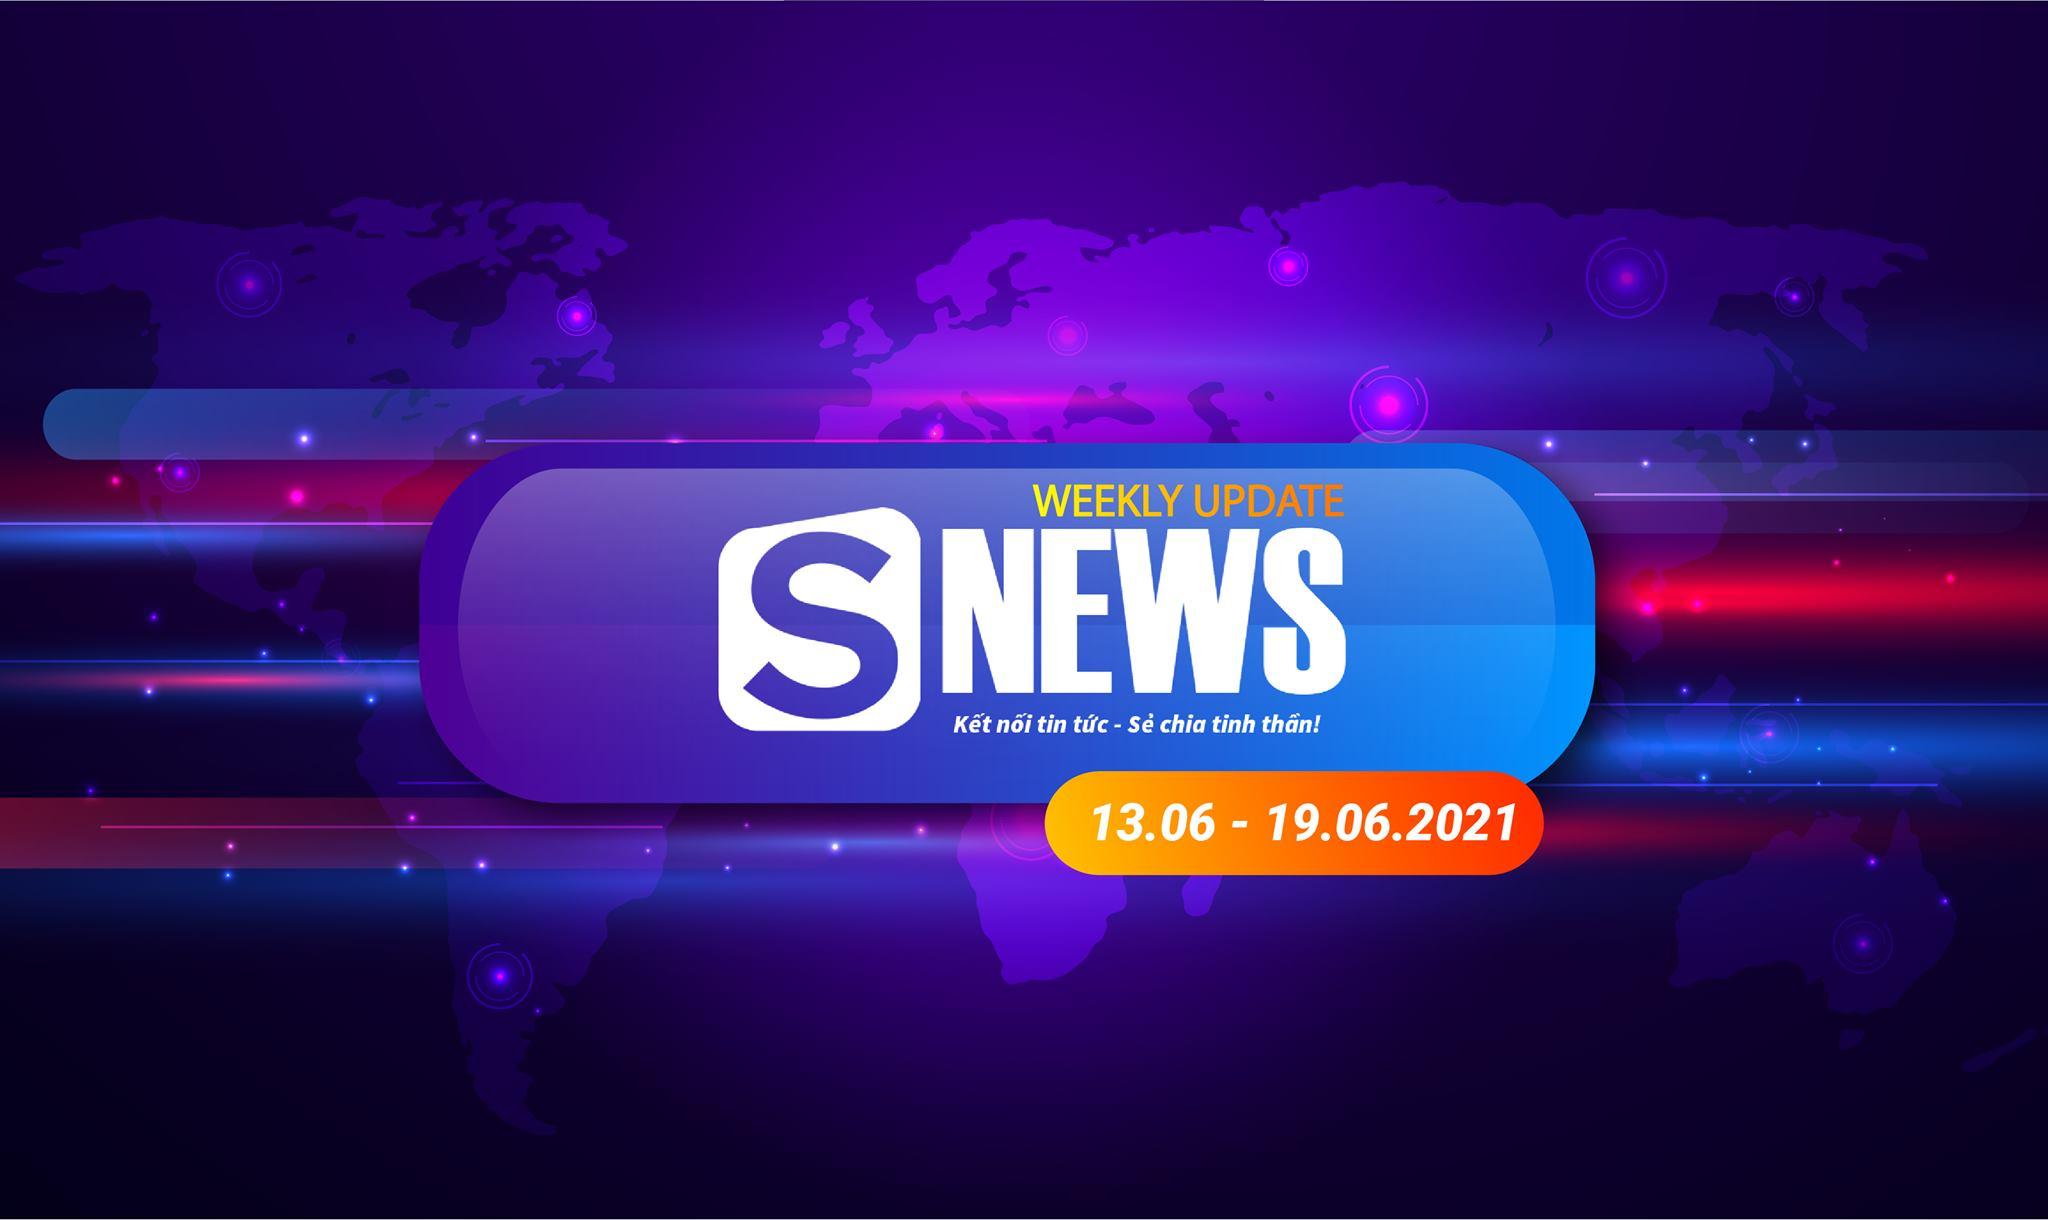 Tổng hợp tin tức Sapo tuần qua: 13.06 - 19.06.2021